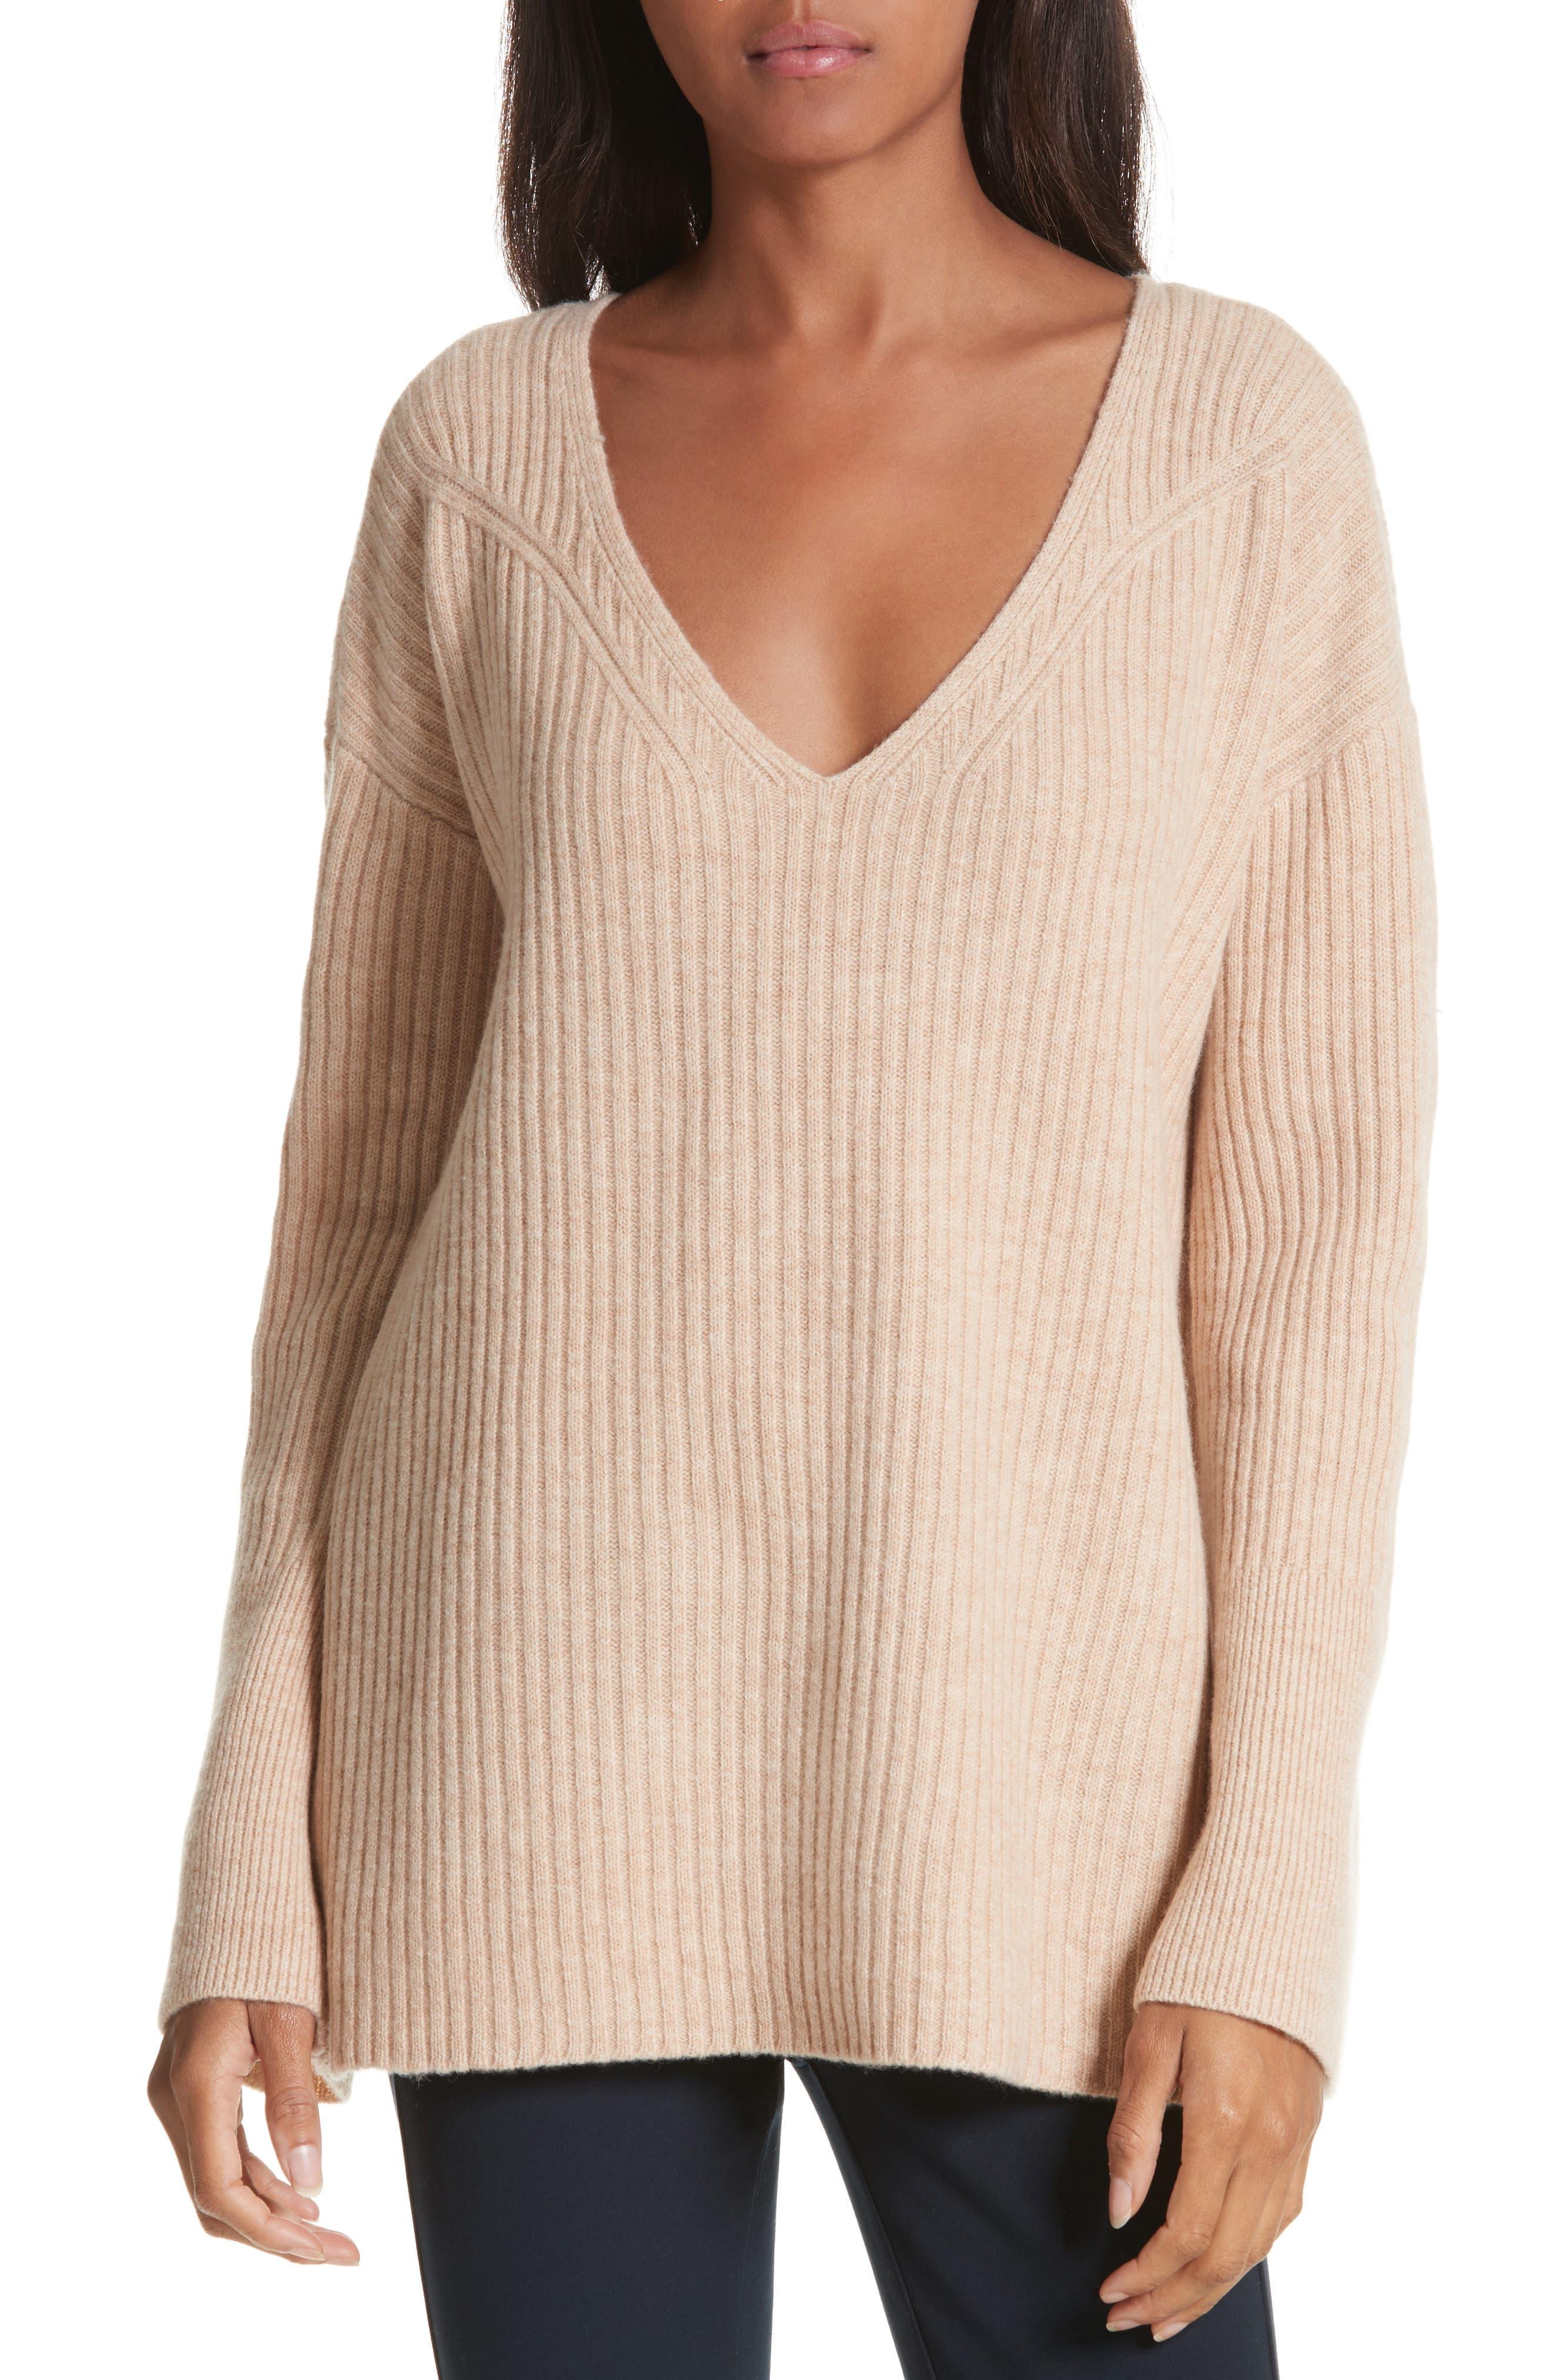 Mitchell Merino Wool Sweater,                         Main,                         color, Oat